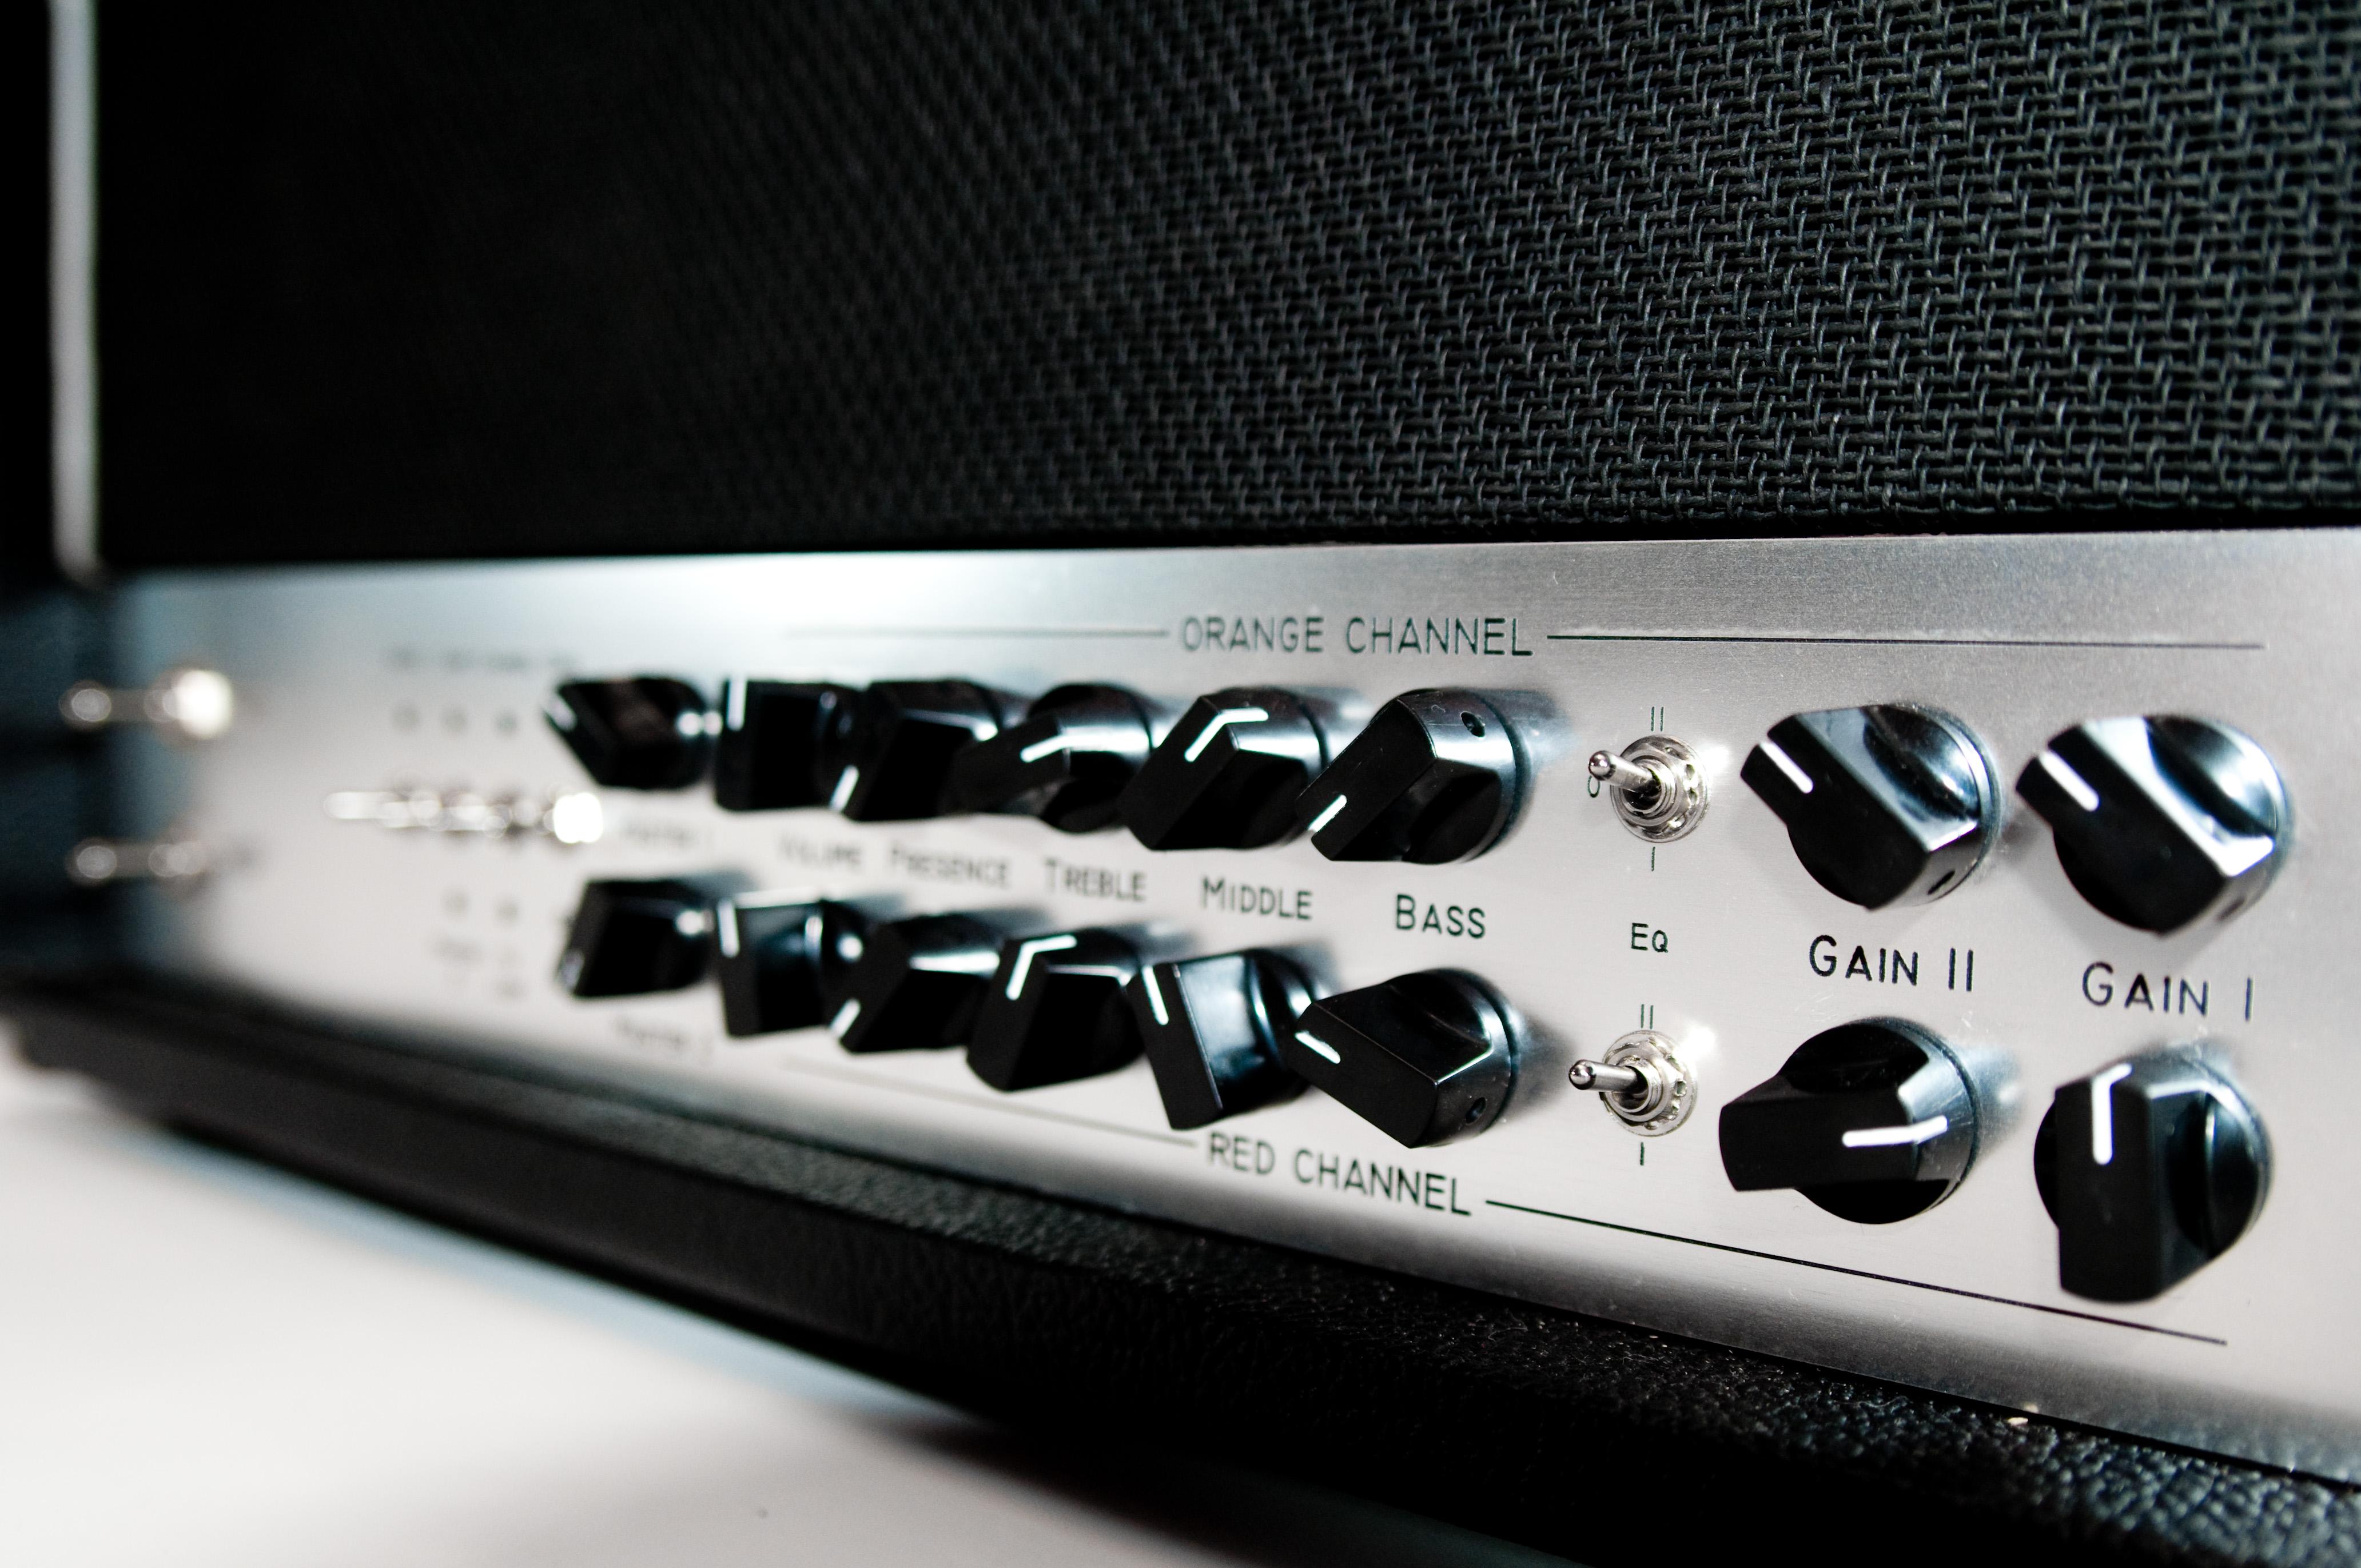 Fender Amp Wallpaper Wallpapersafari Audio Power Amplifier Circuit Hd Walls Find Wallpapers 0x0 Music Guitar Background Id 4129x2743